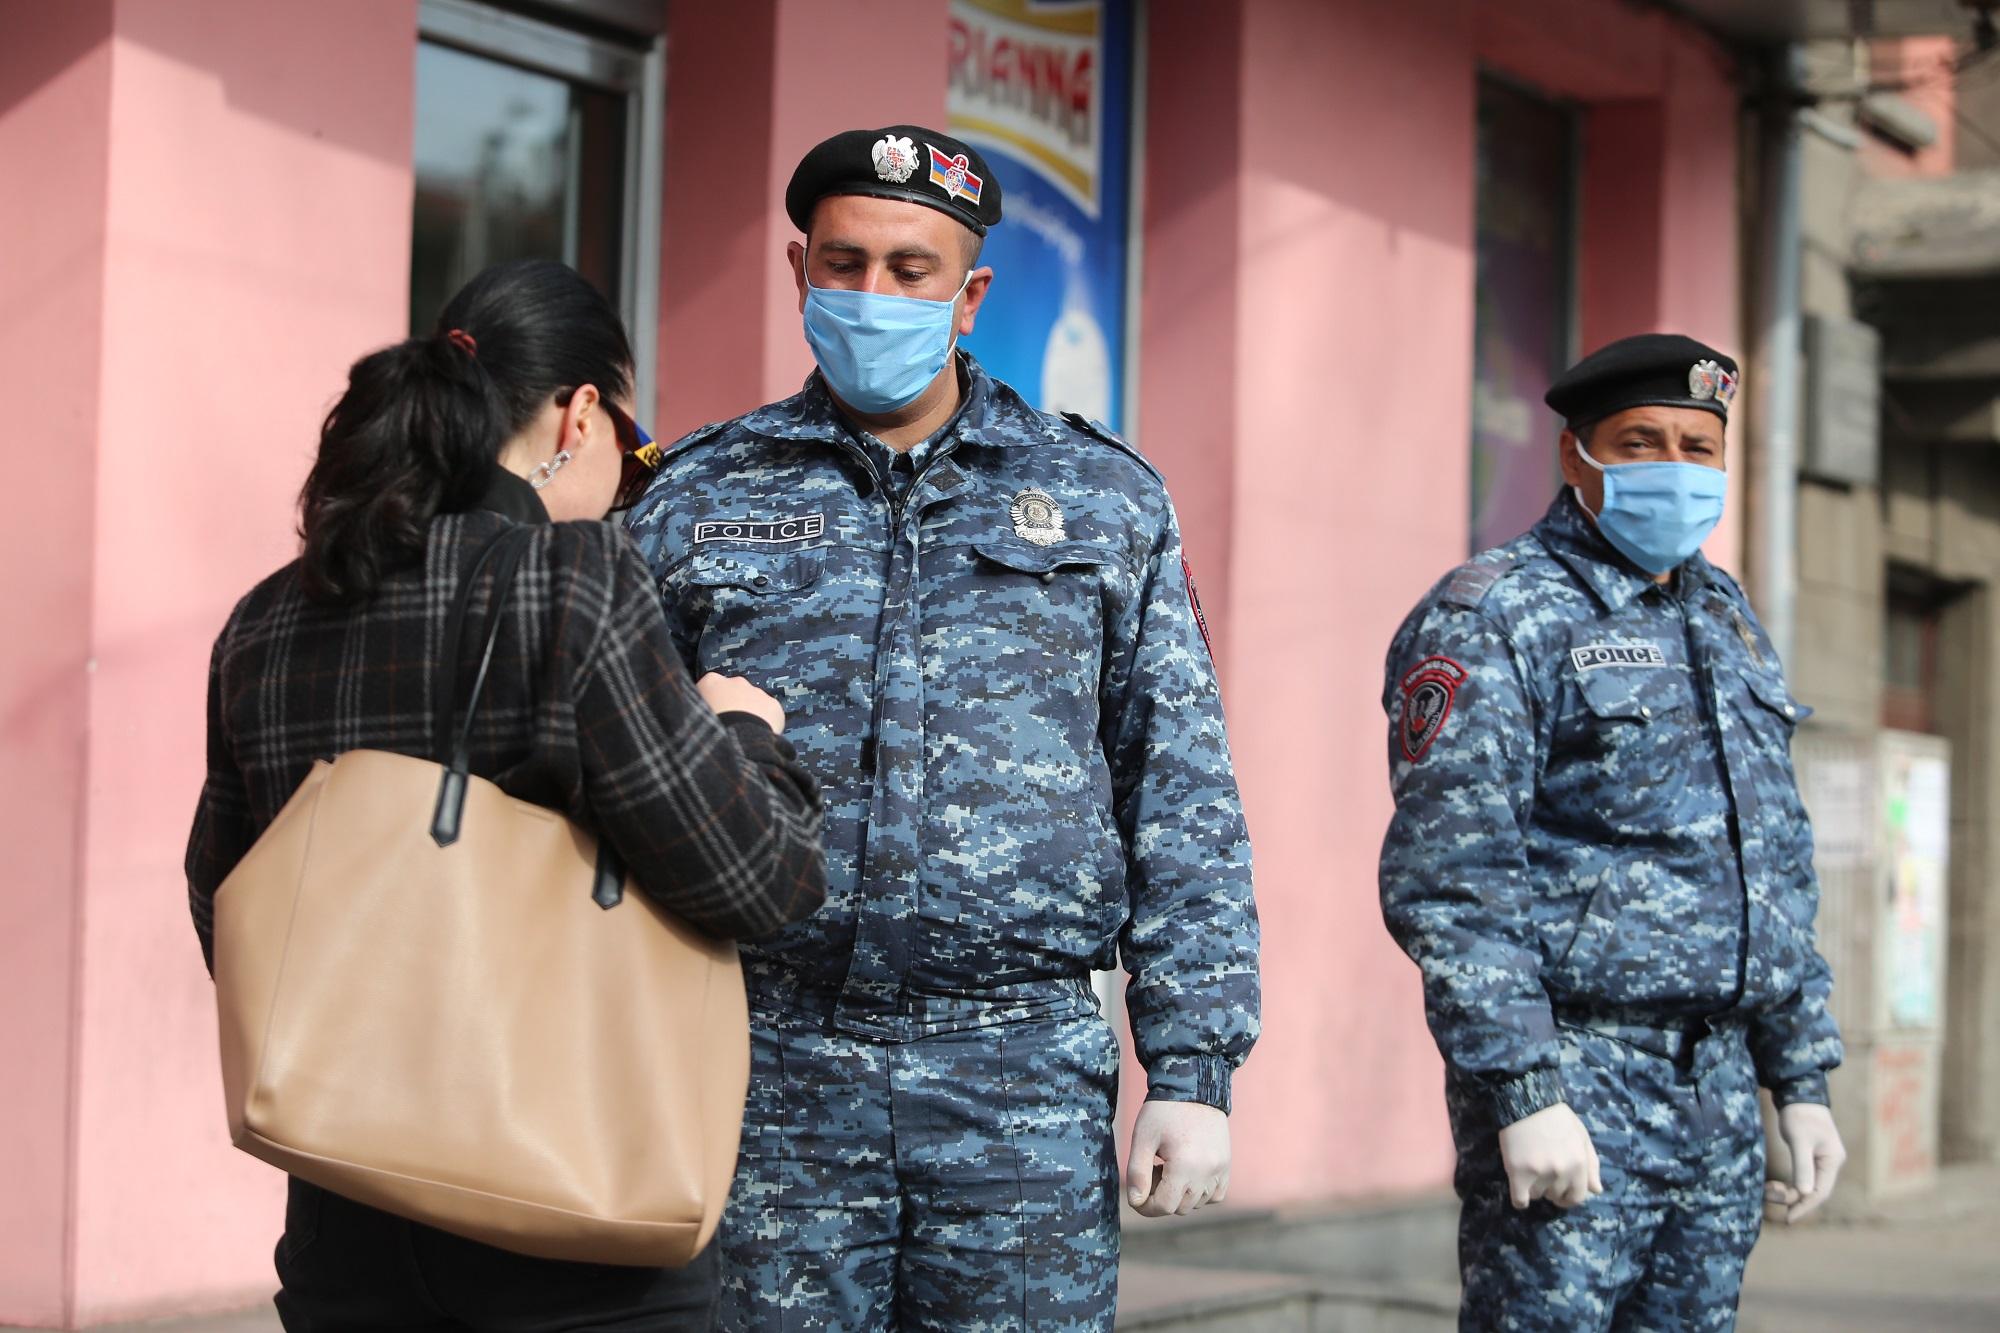 коронавирус, министр здравоохранения, Арсен Торосян, вспышка, пресс-конференция